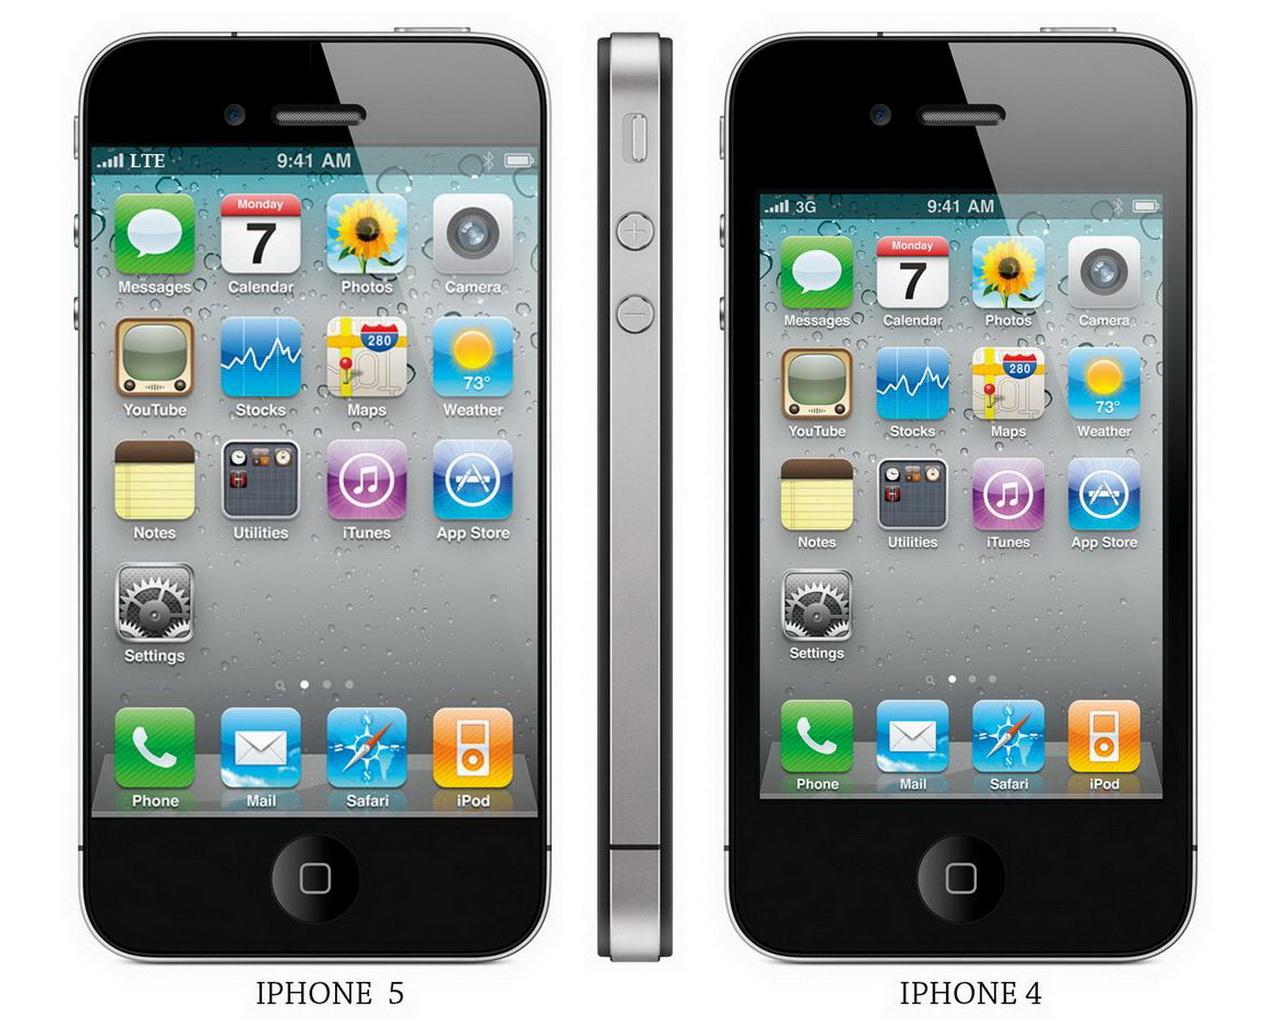 Iphone 5 Обои для рабочего стола 1280x1024: zastavki.com/rus/computers/apple/wallpaper-32151-10.htm